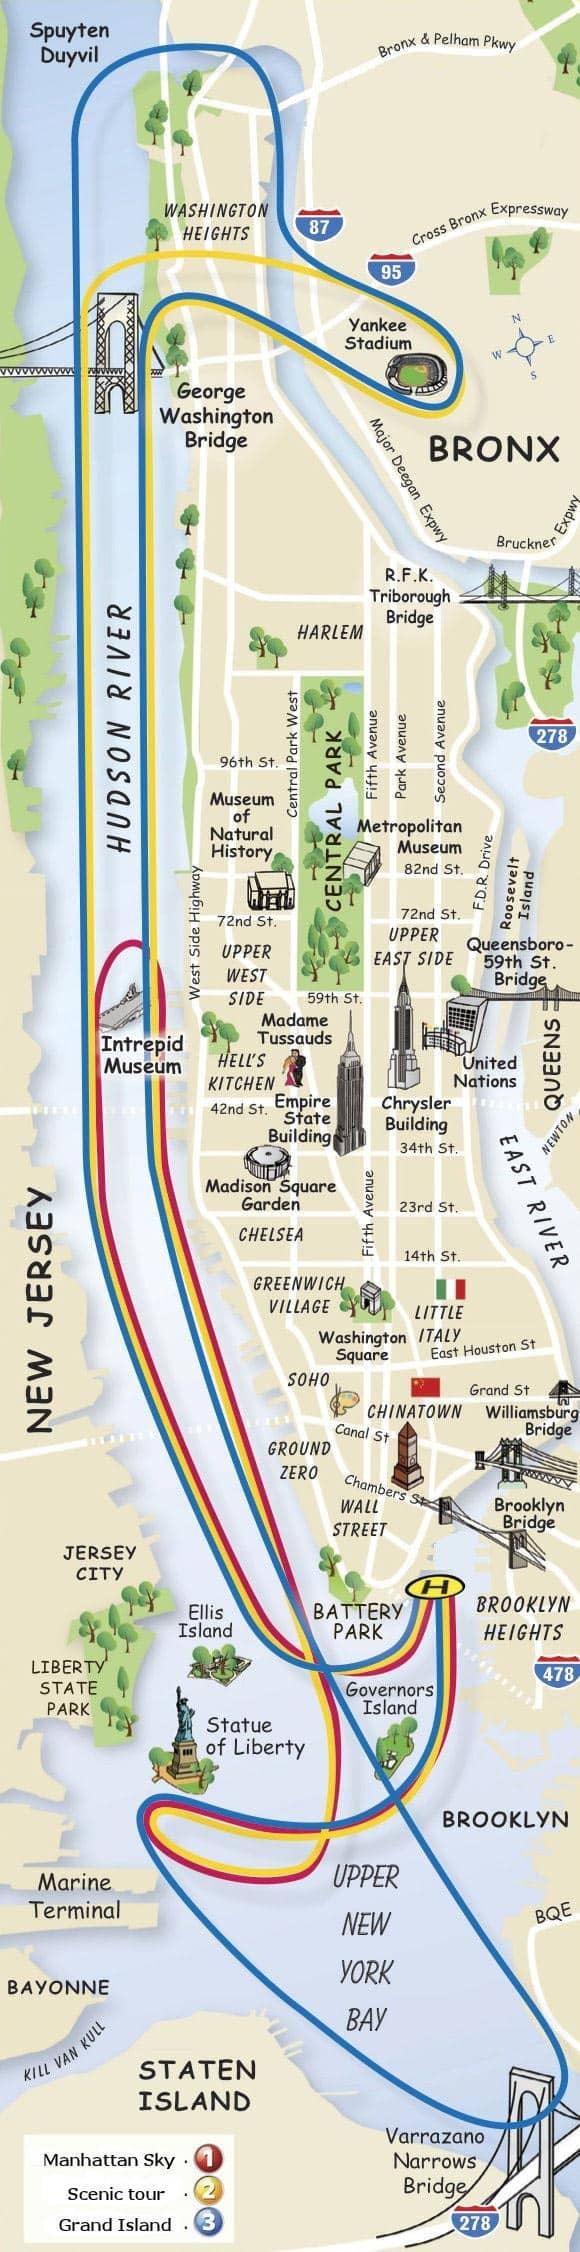 New York Helikopterrouten - Karte